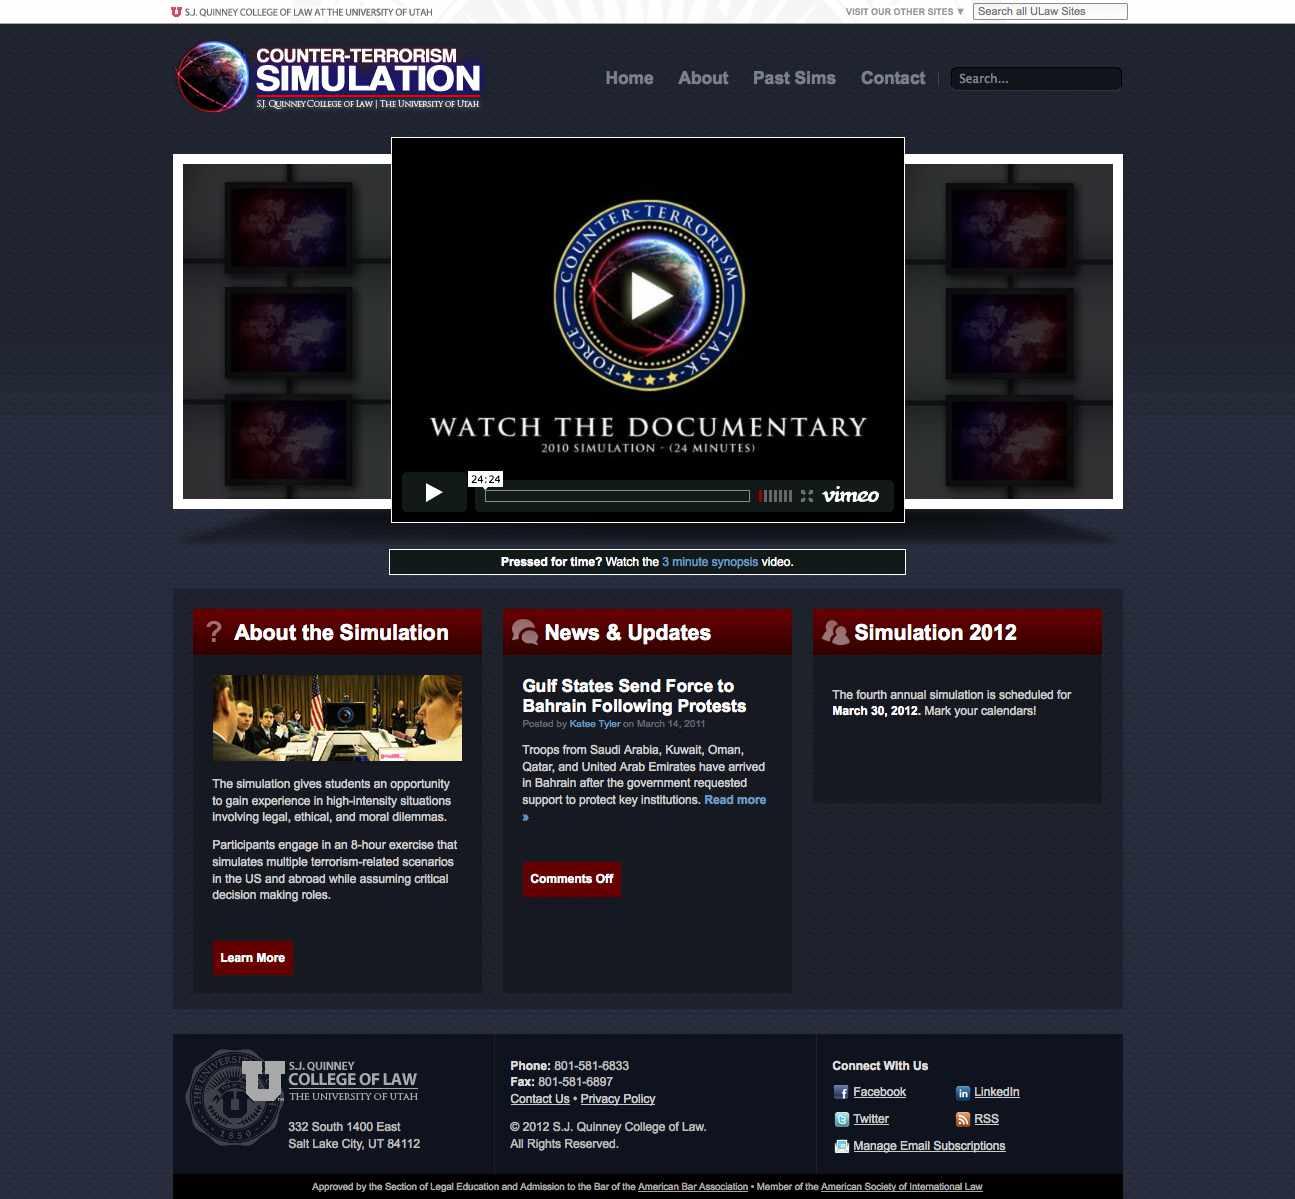 Screenshot of counter-terrorism sim website